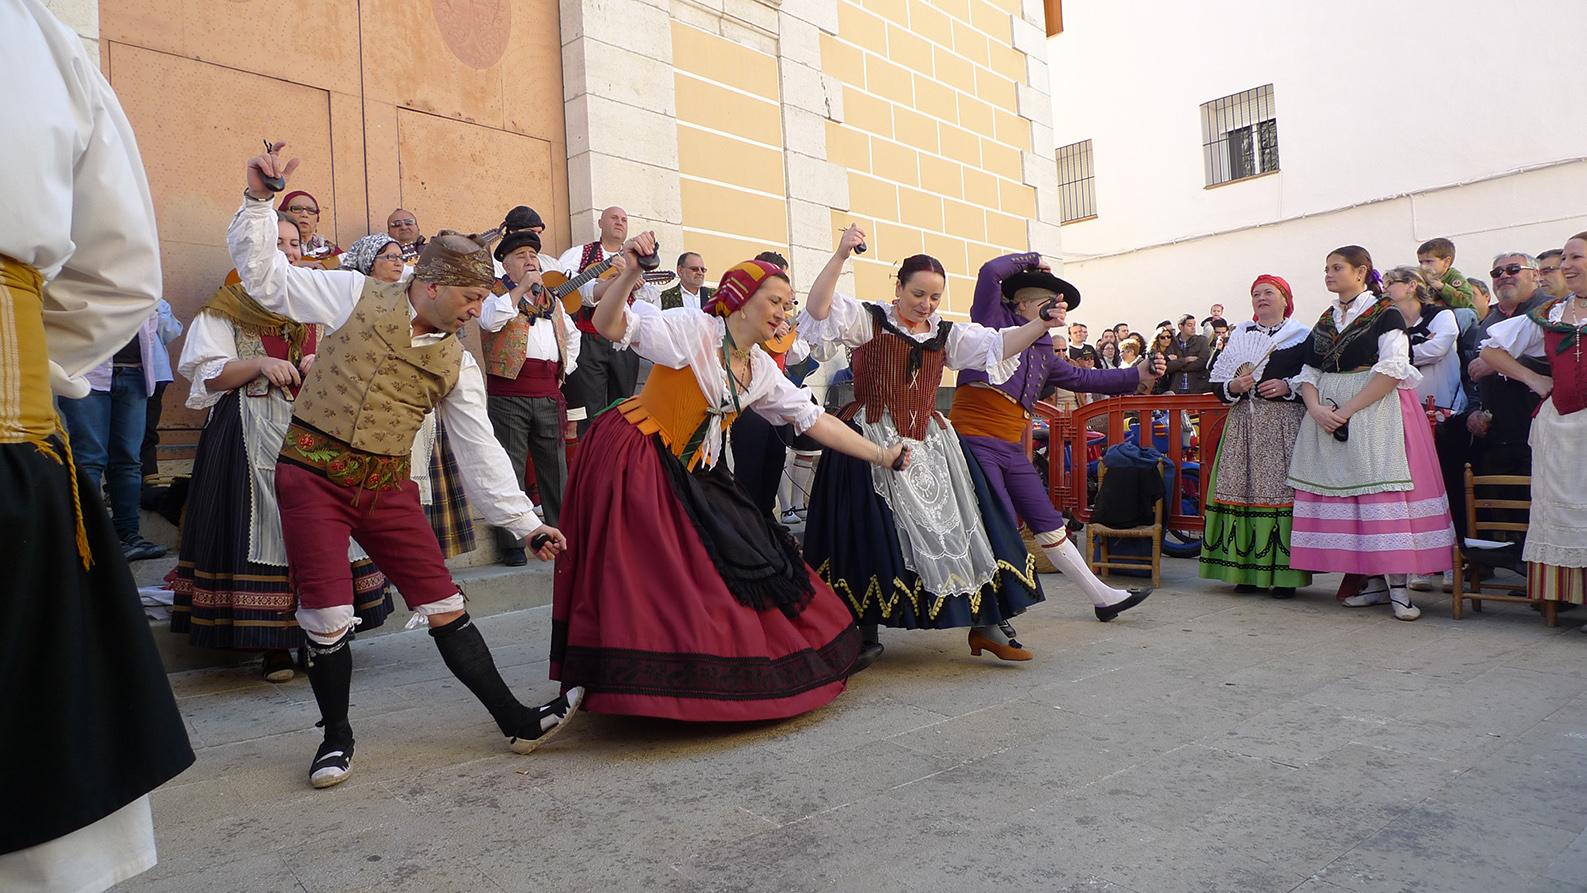 2014-02-23 - Baladre a Fira St. Marcia-ROTOVA (31)